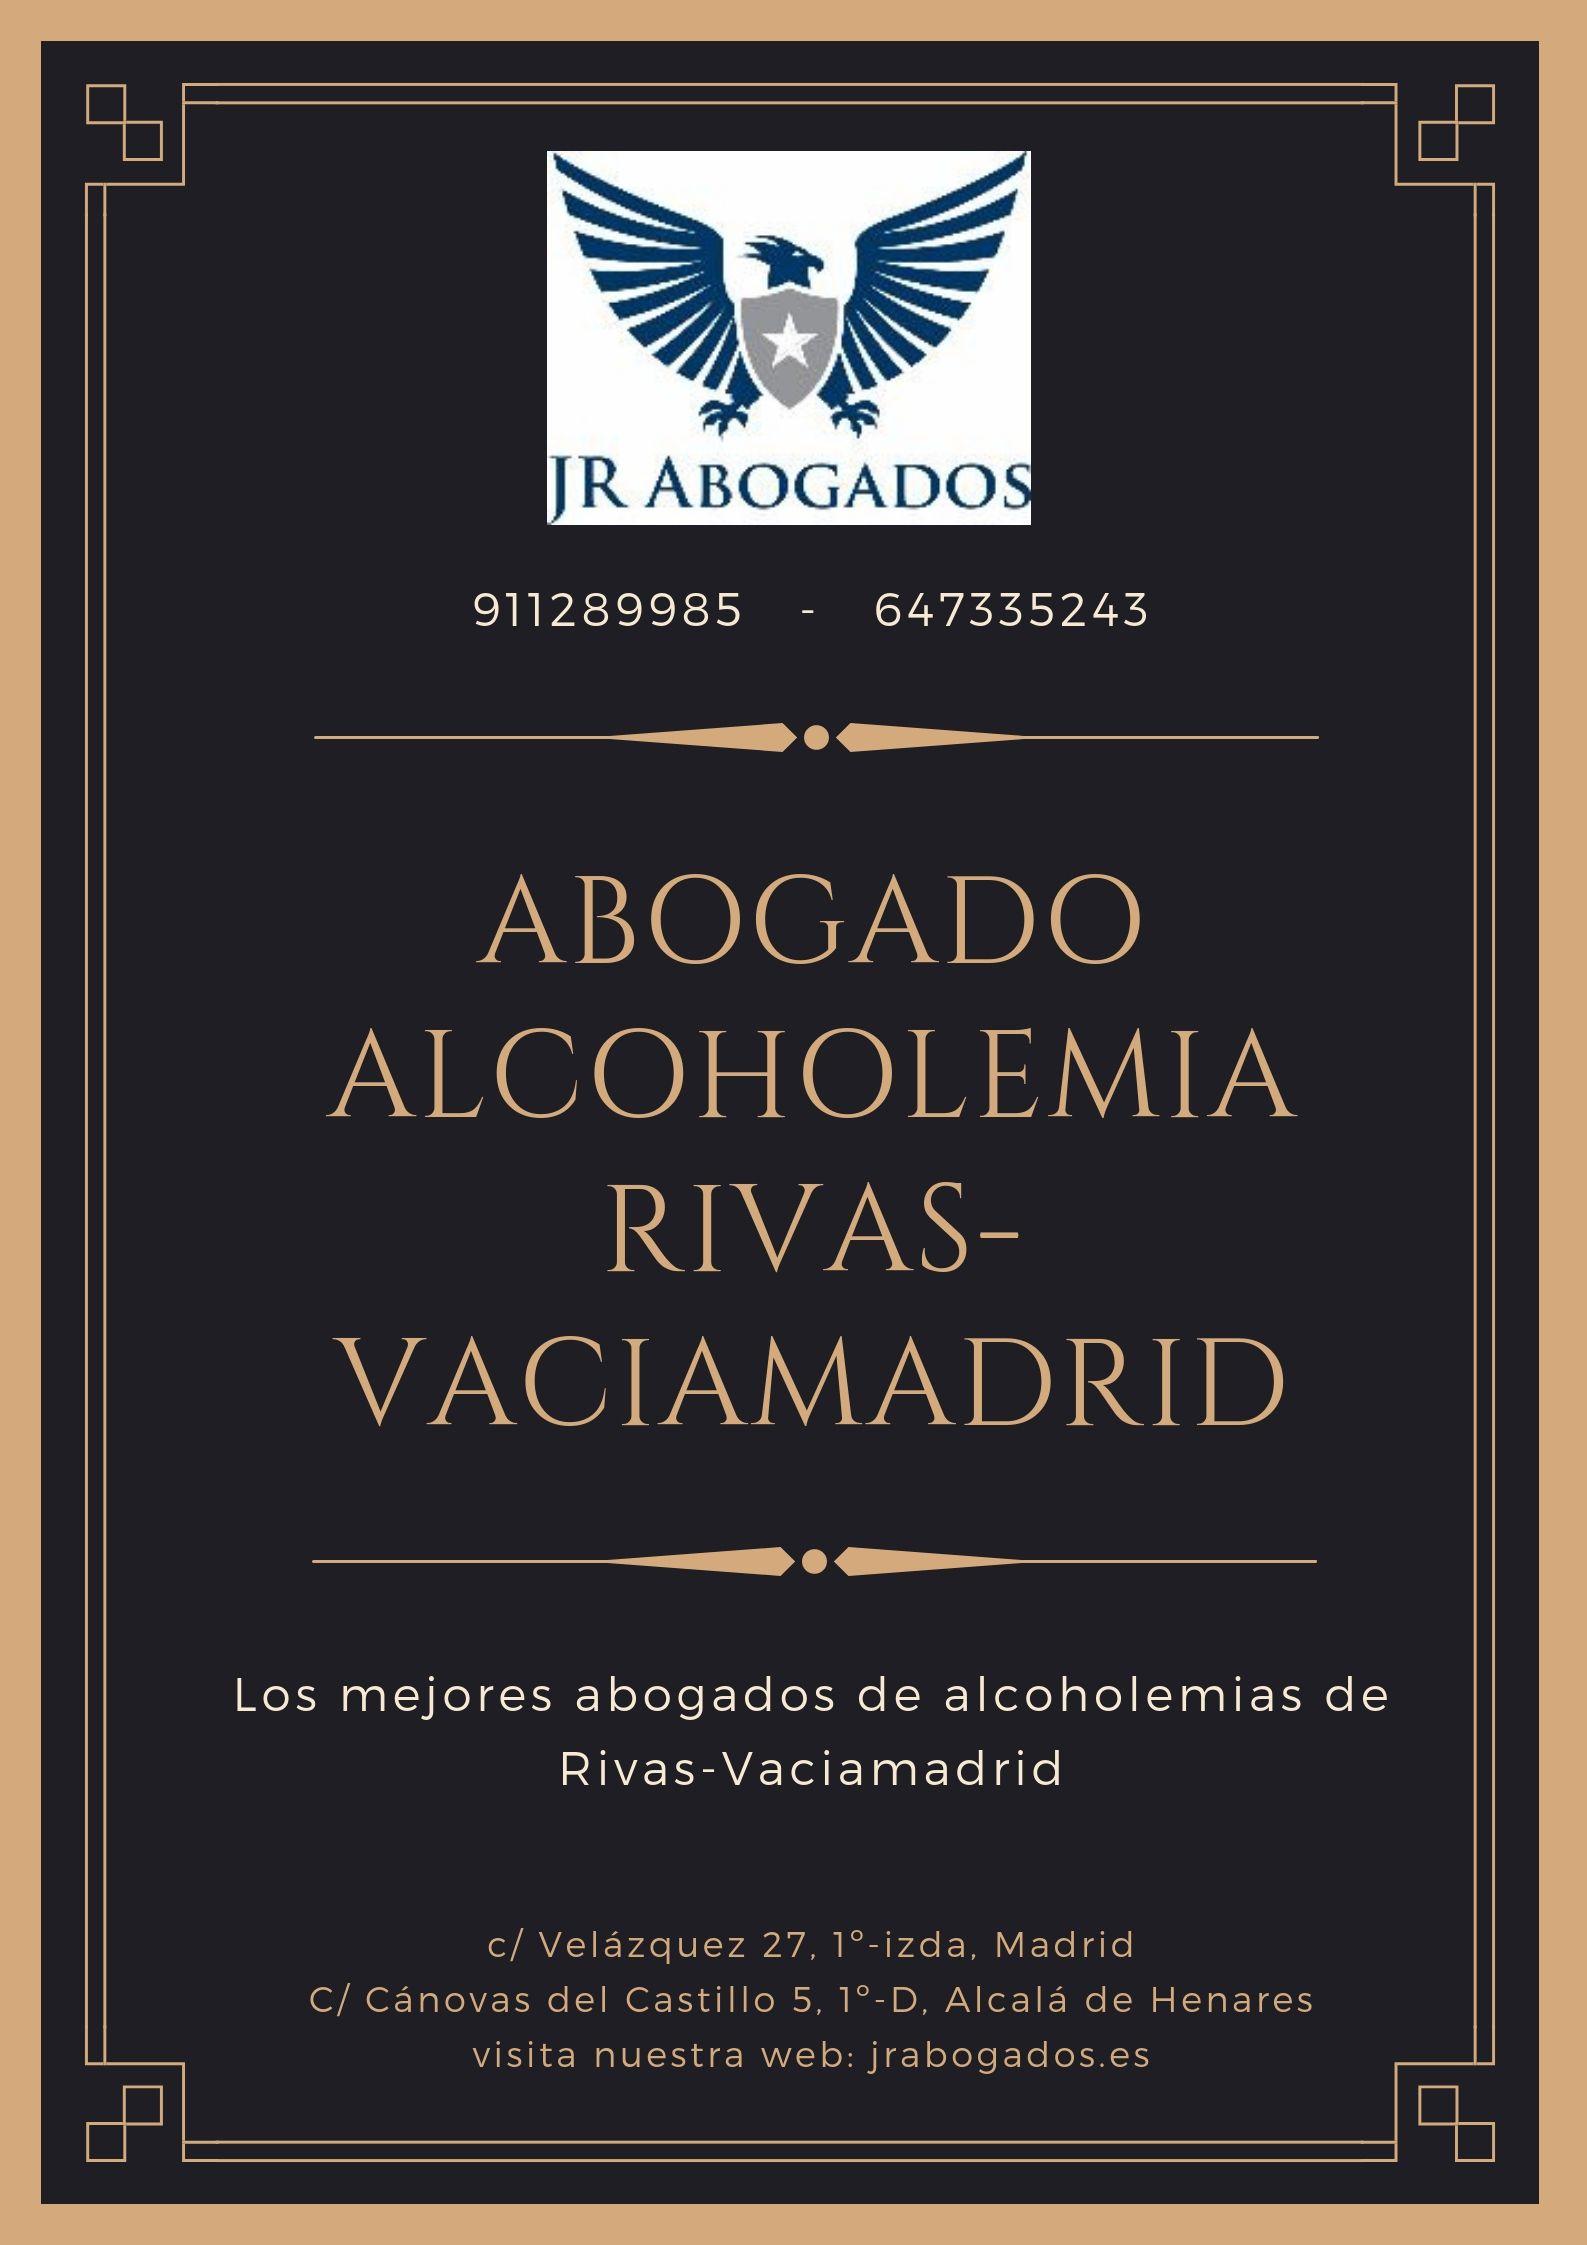 abogado.alcoholemia.rivas-vaciamadrid